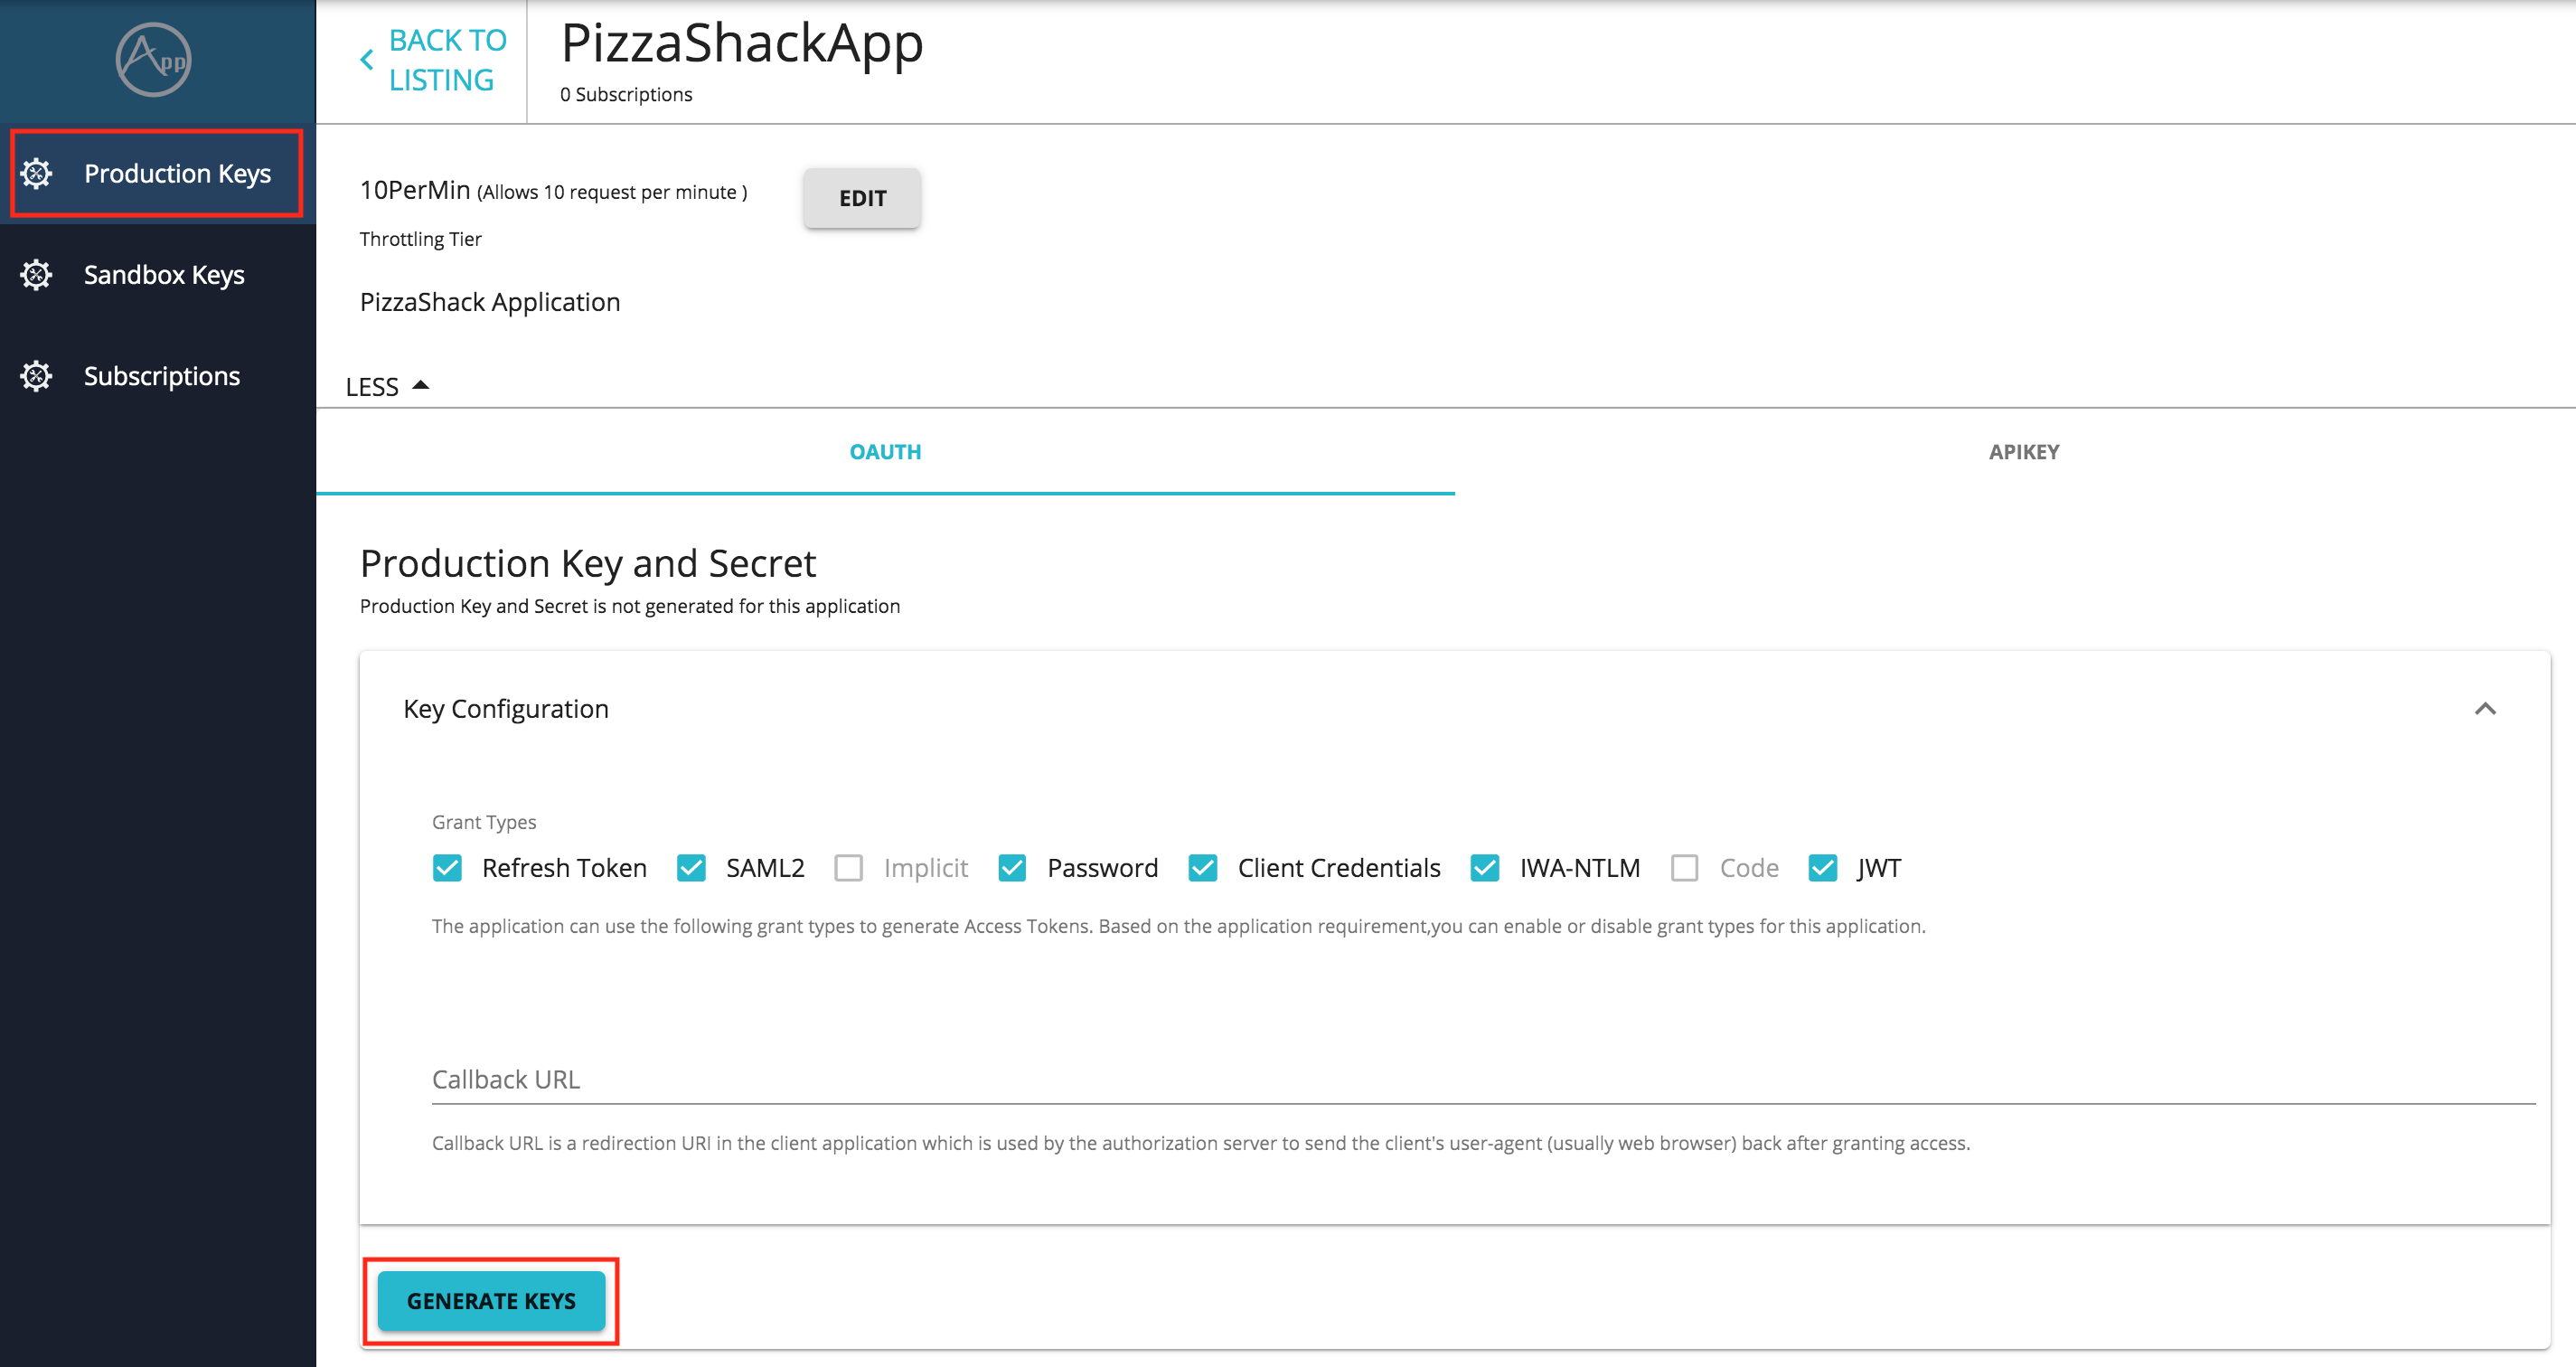 Generate Application Keys